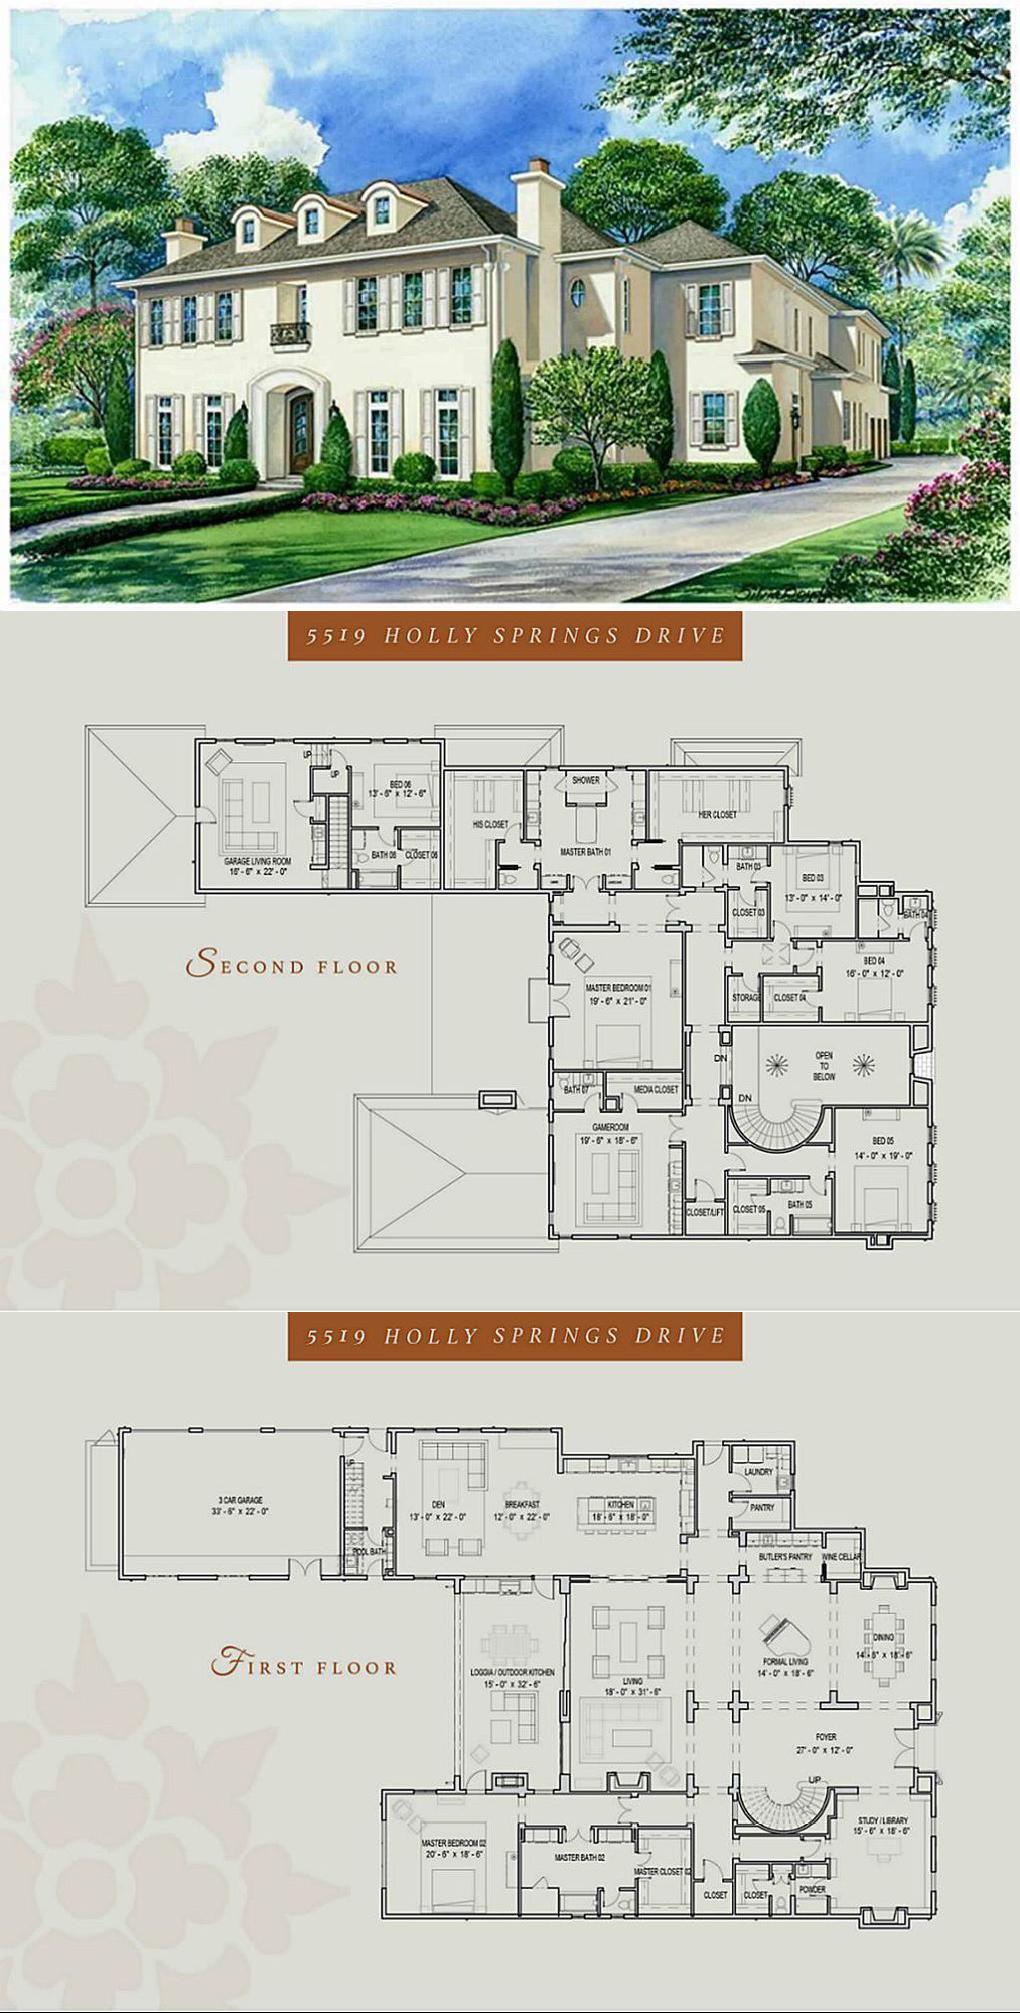 5519 Holly Springs Dr Houston Tx 77056 Mansion Floor Plan House Plans Mansion Mansion Plans